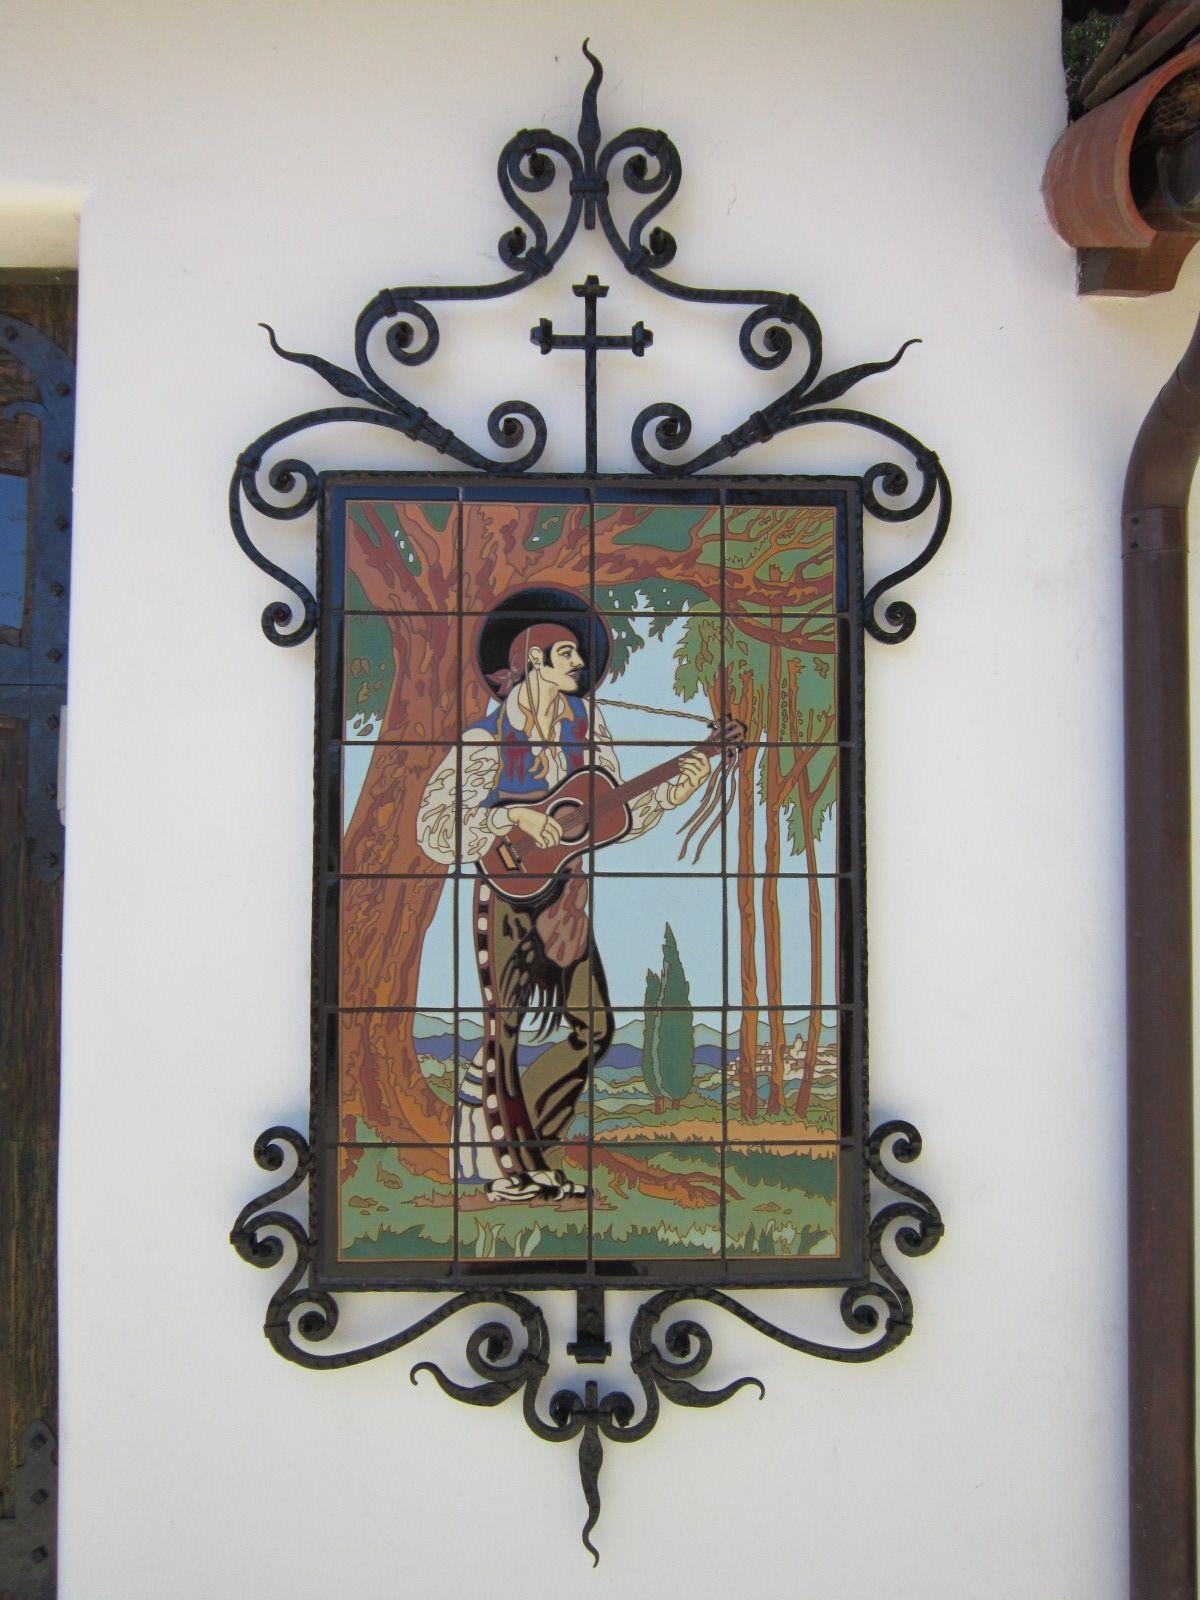 Senor Dancer Tile Mural In Our Iron Frame Tile Murals Vintage